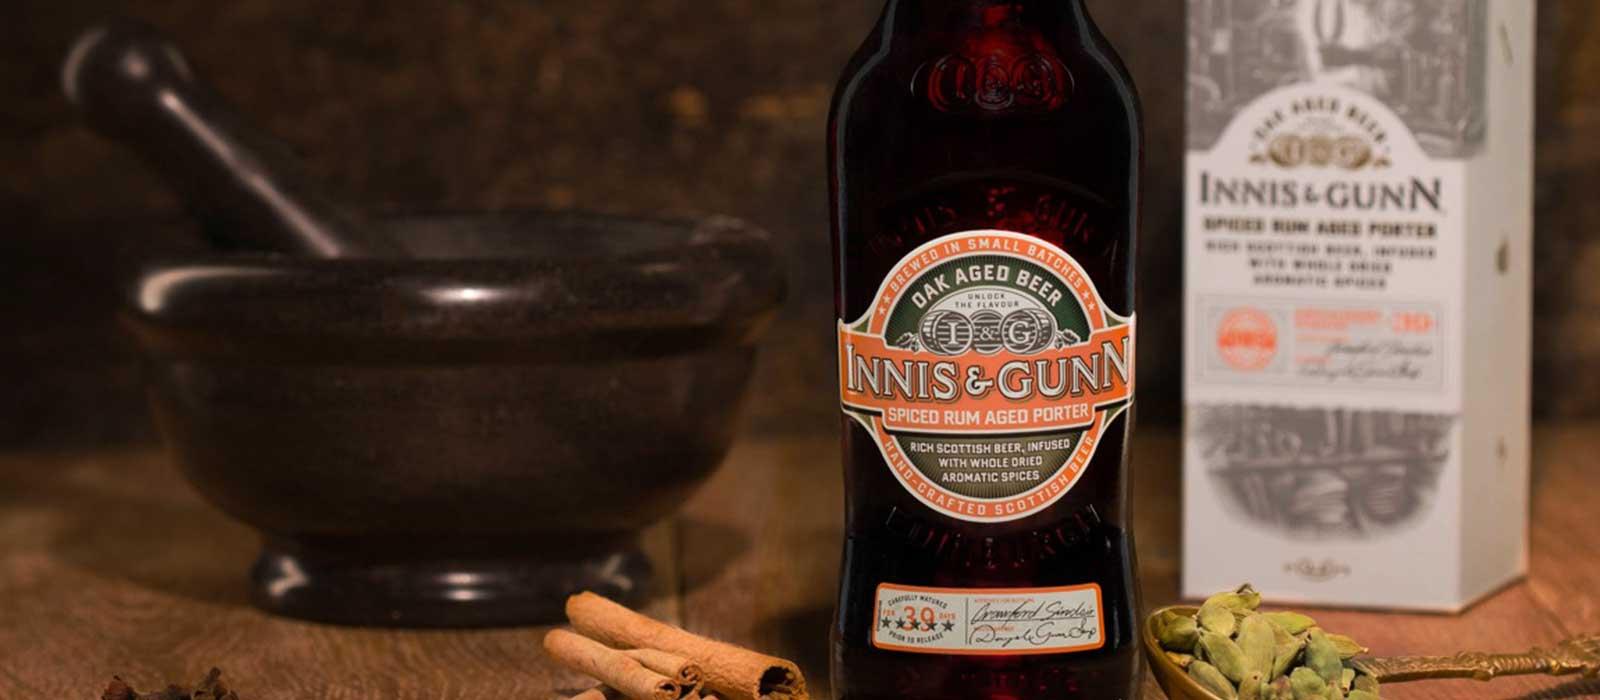 Spiced Rum Aged Porter från Innis & Gunn